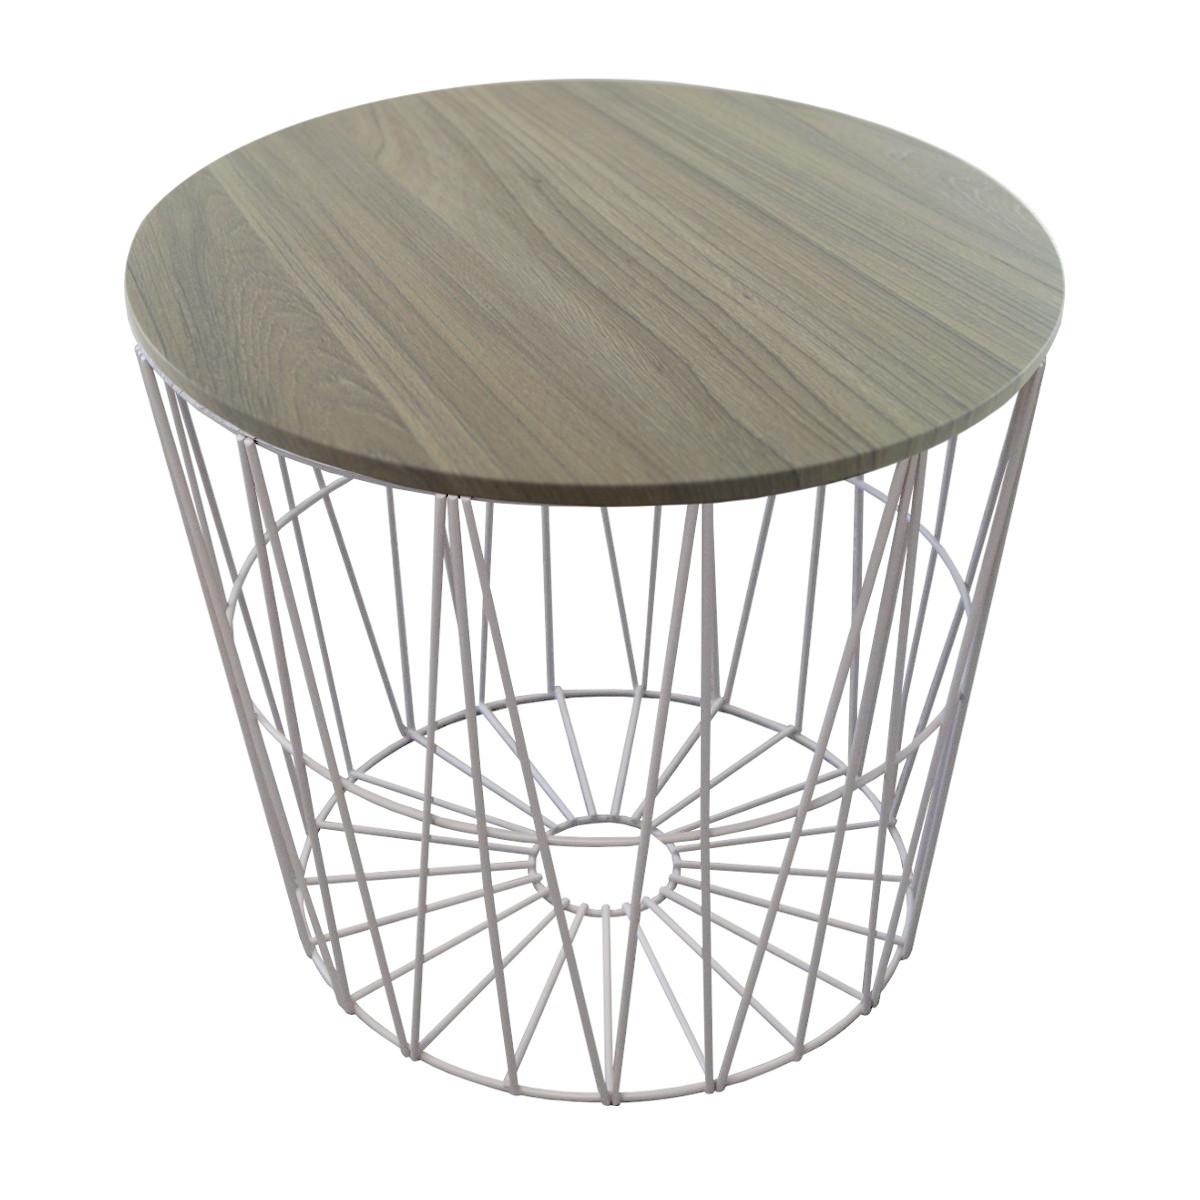 design drahtk rbe in 4 gr en drahtkorb tisch korb mit deckel grau ebay. Black Bedroom Furniture Sets. Home Design Ideas